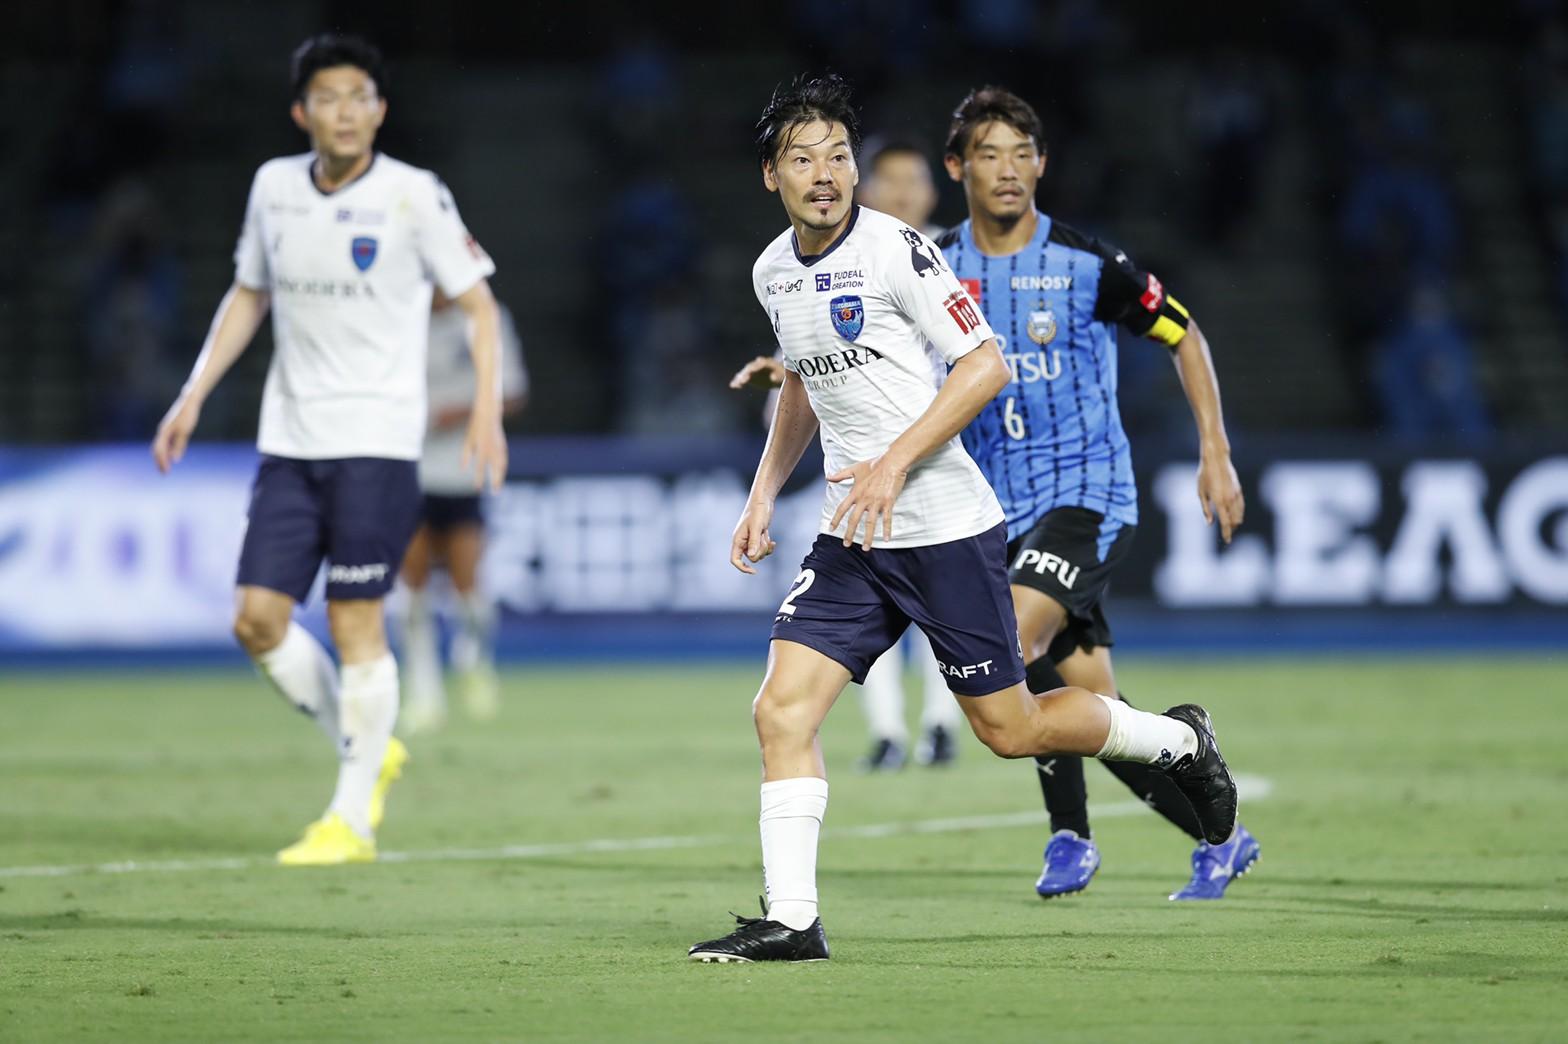 Japanese veteran midfielder Daisuke Matsui joins Saigon FC